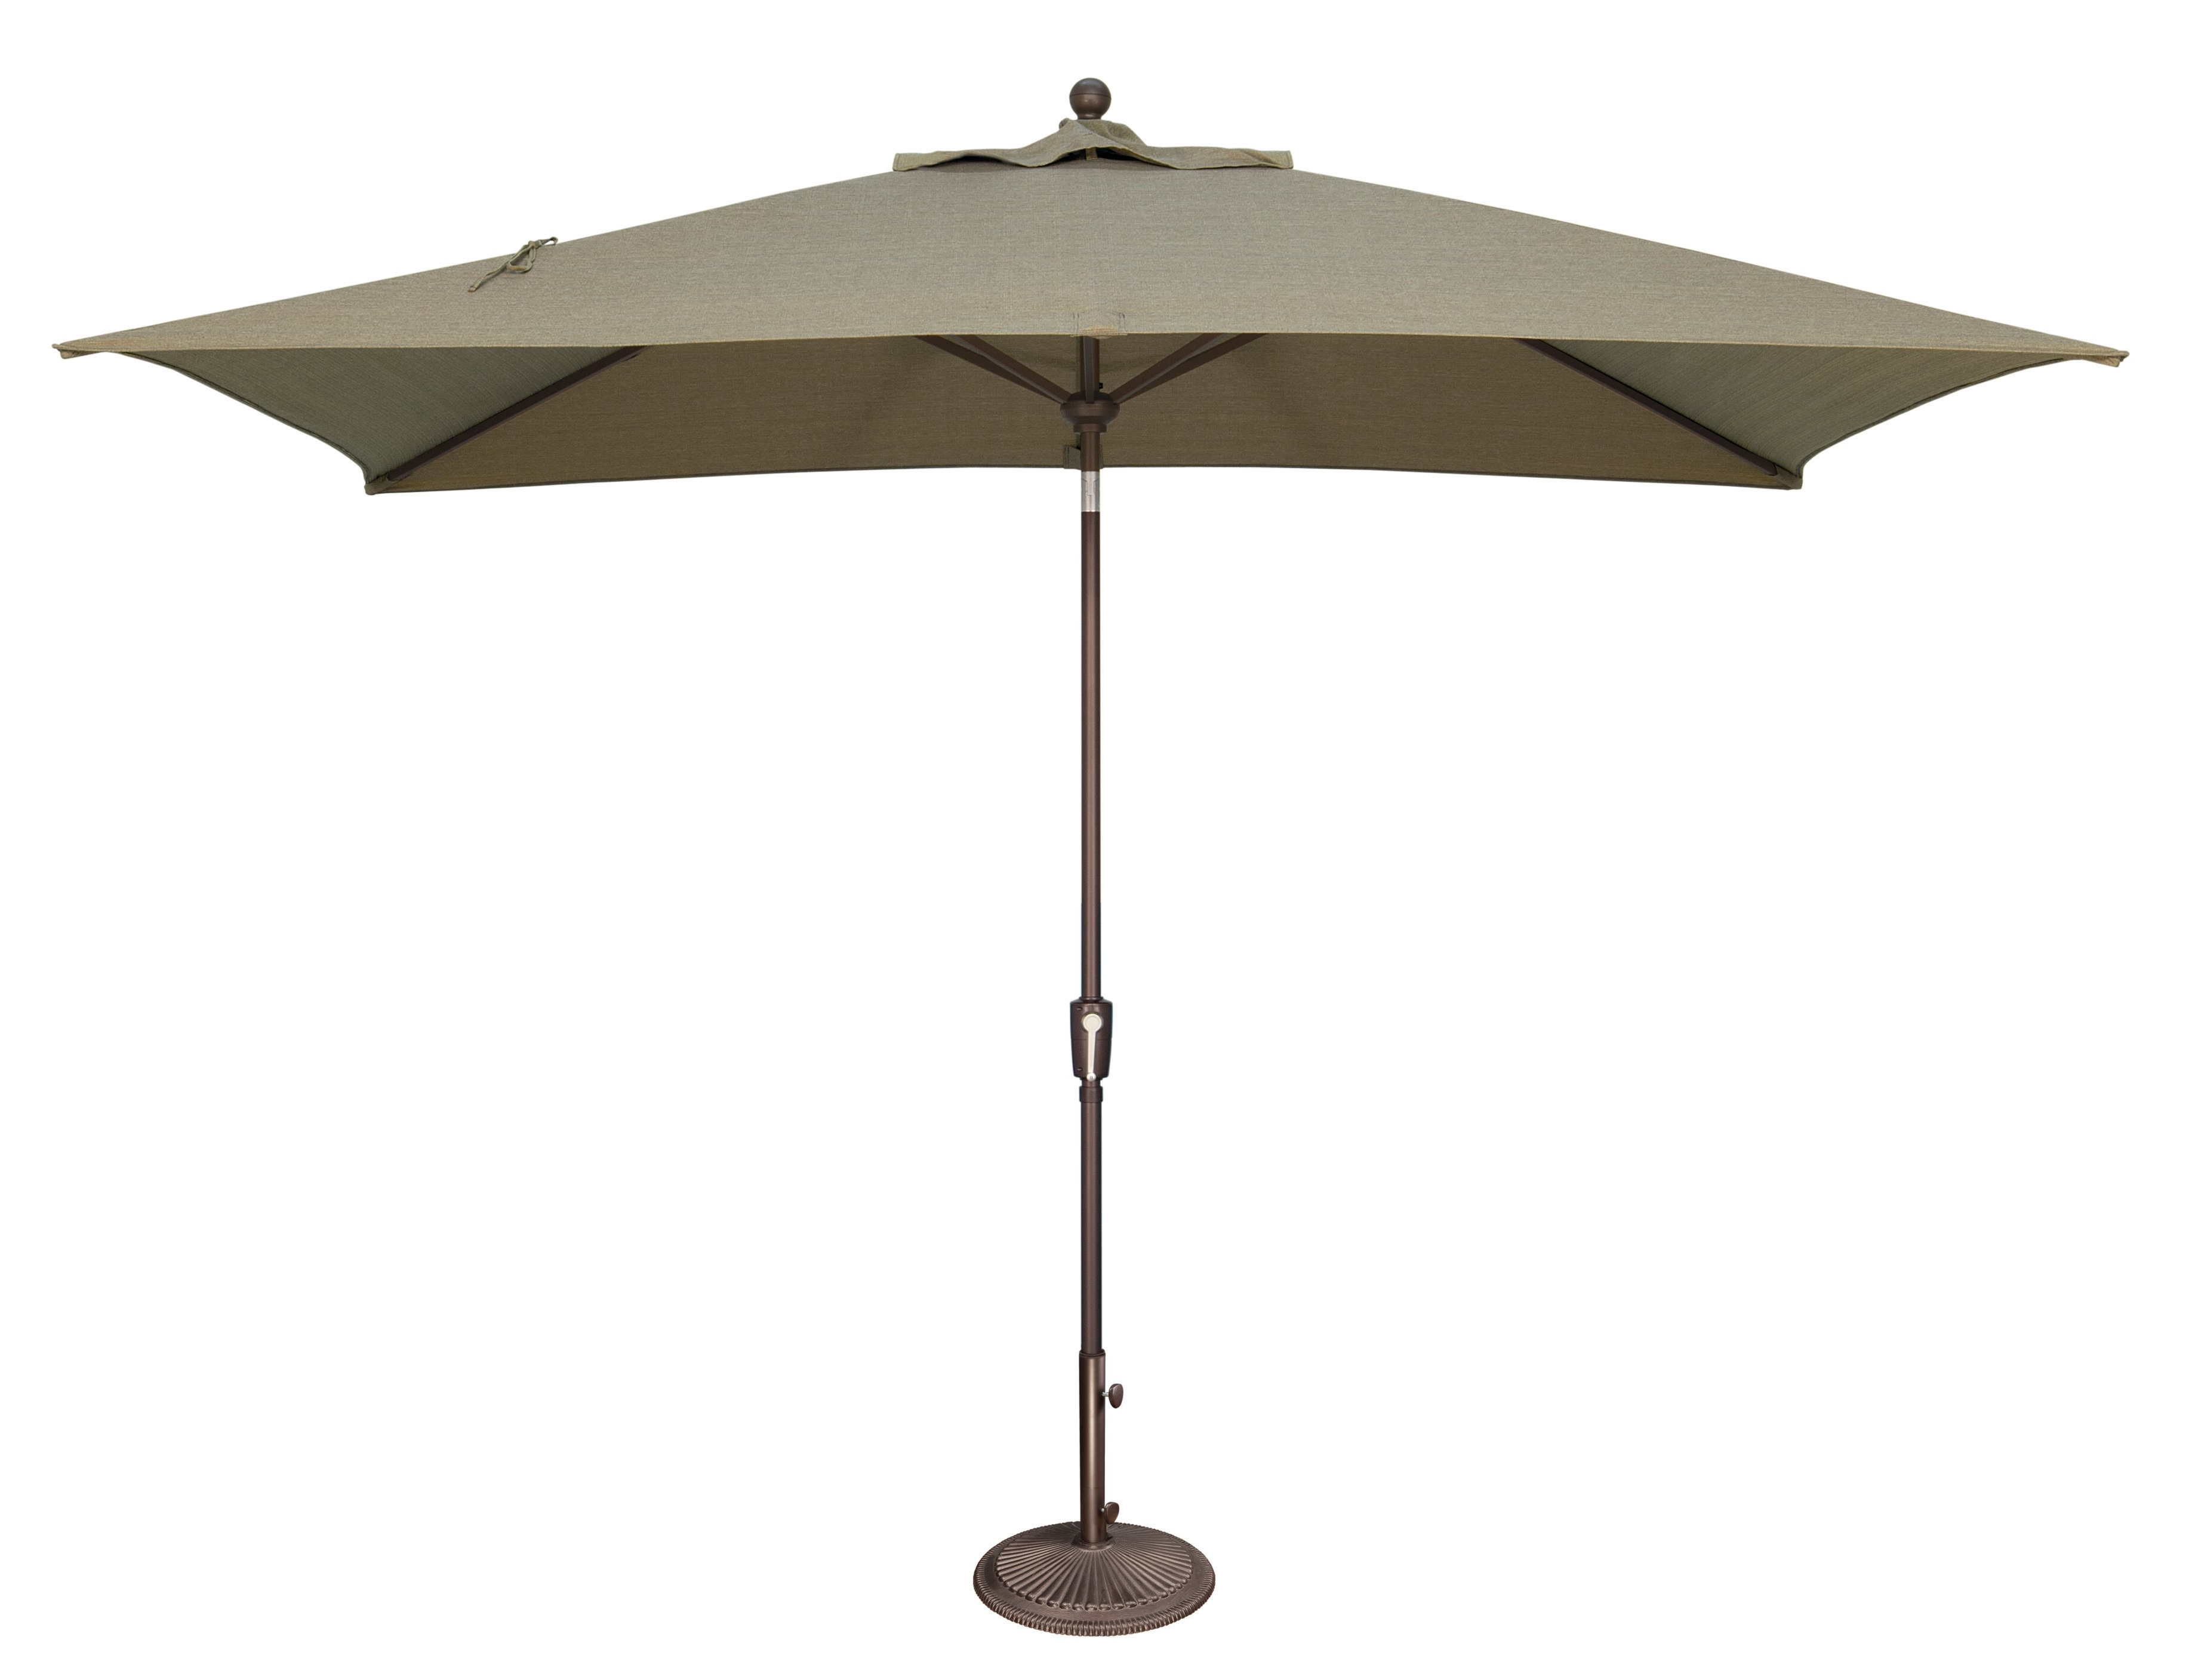 Crowland Market Sunbrella Umbrellas With Regard To Fashionable Launceston 10' X (View 4 of 20)